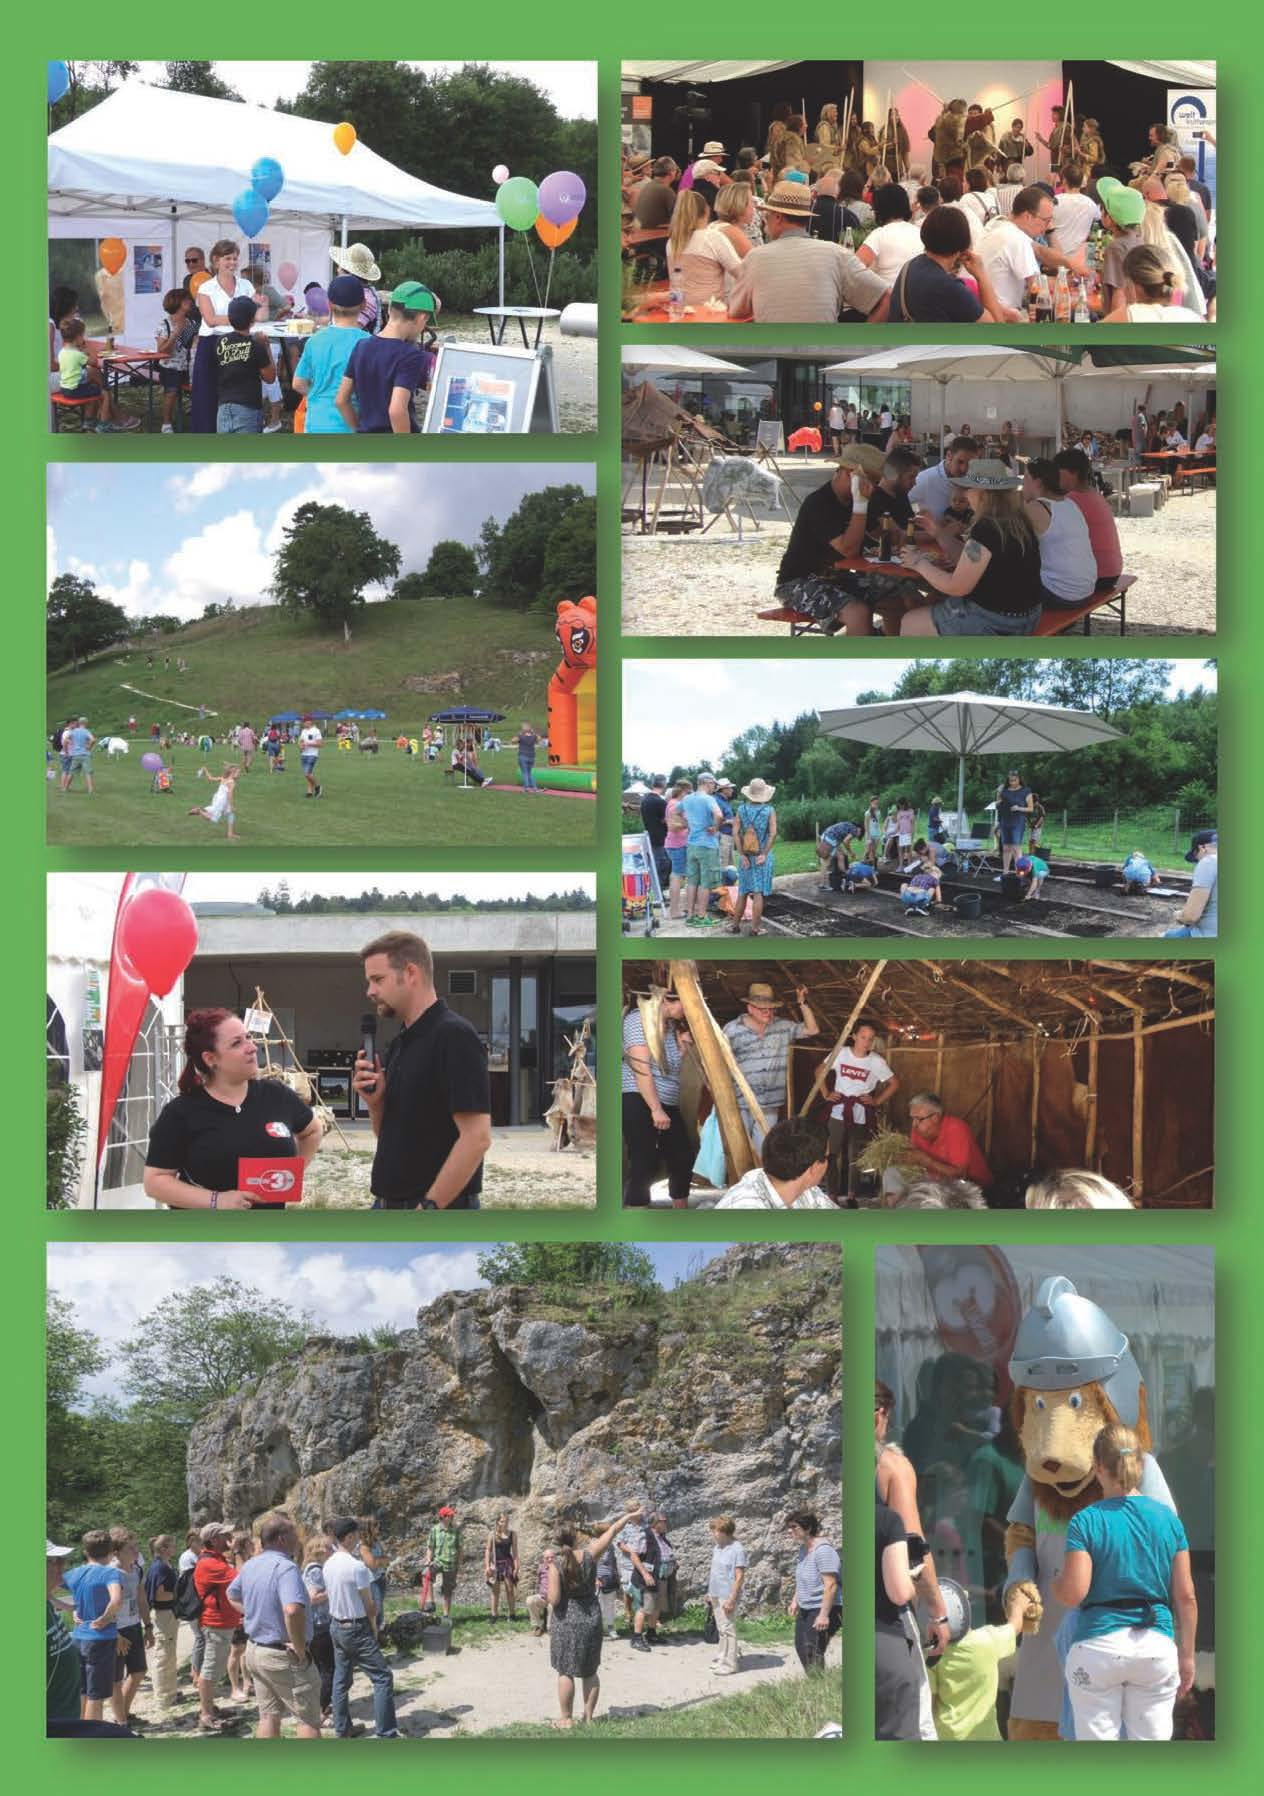 Rückblick Sommerfest im Archäopark 22. Juli 2017